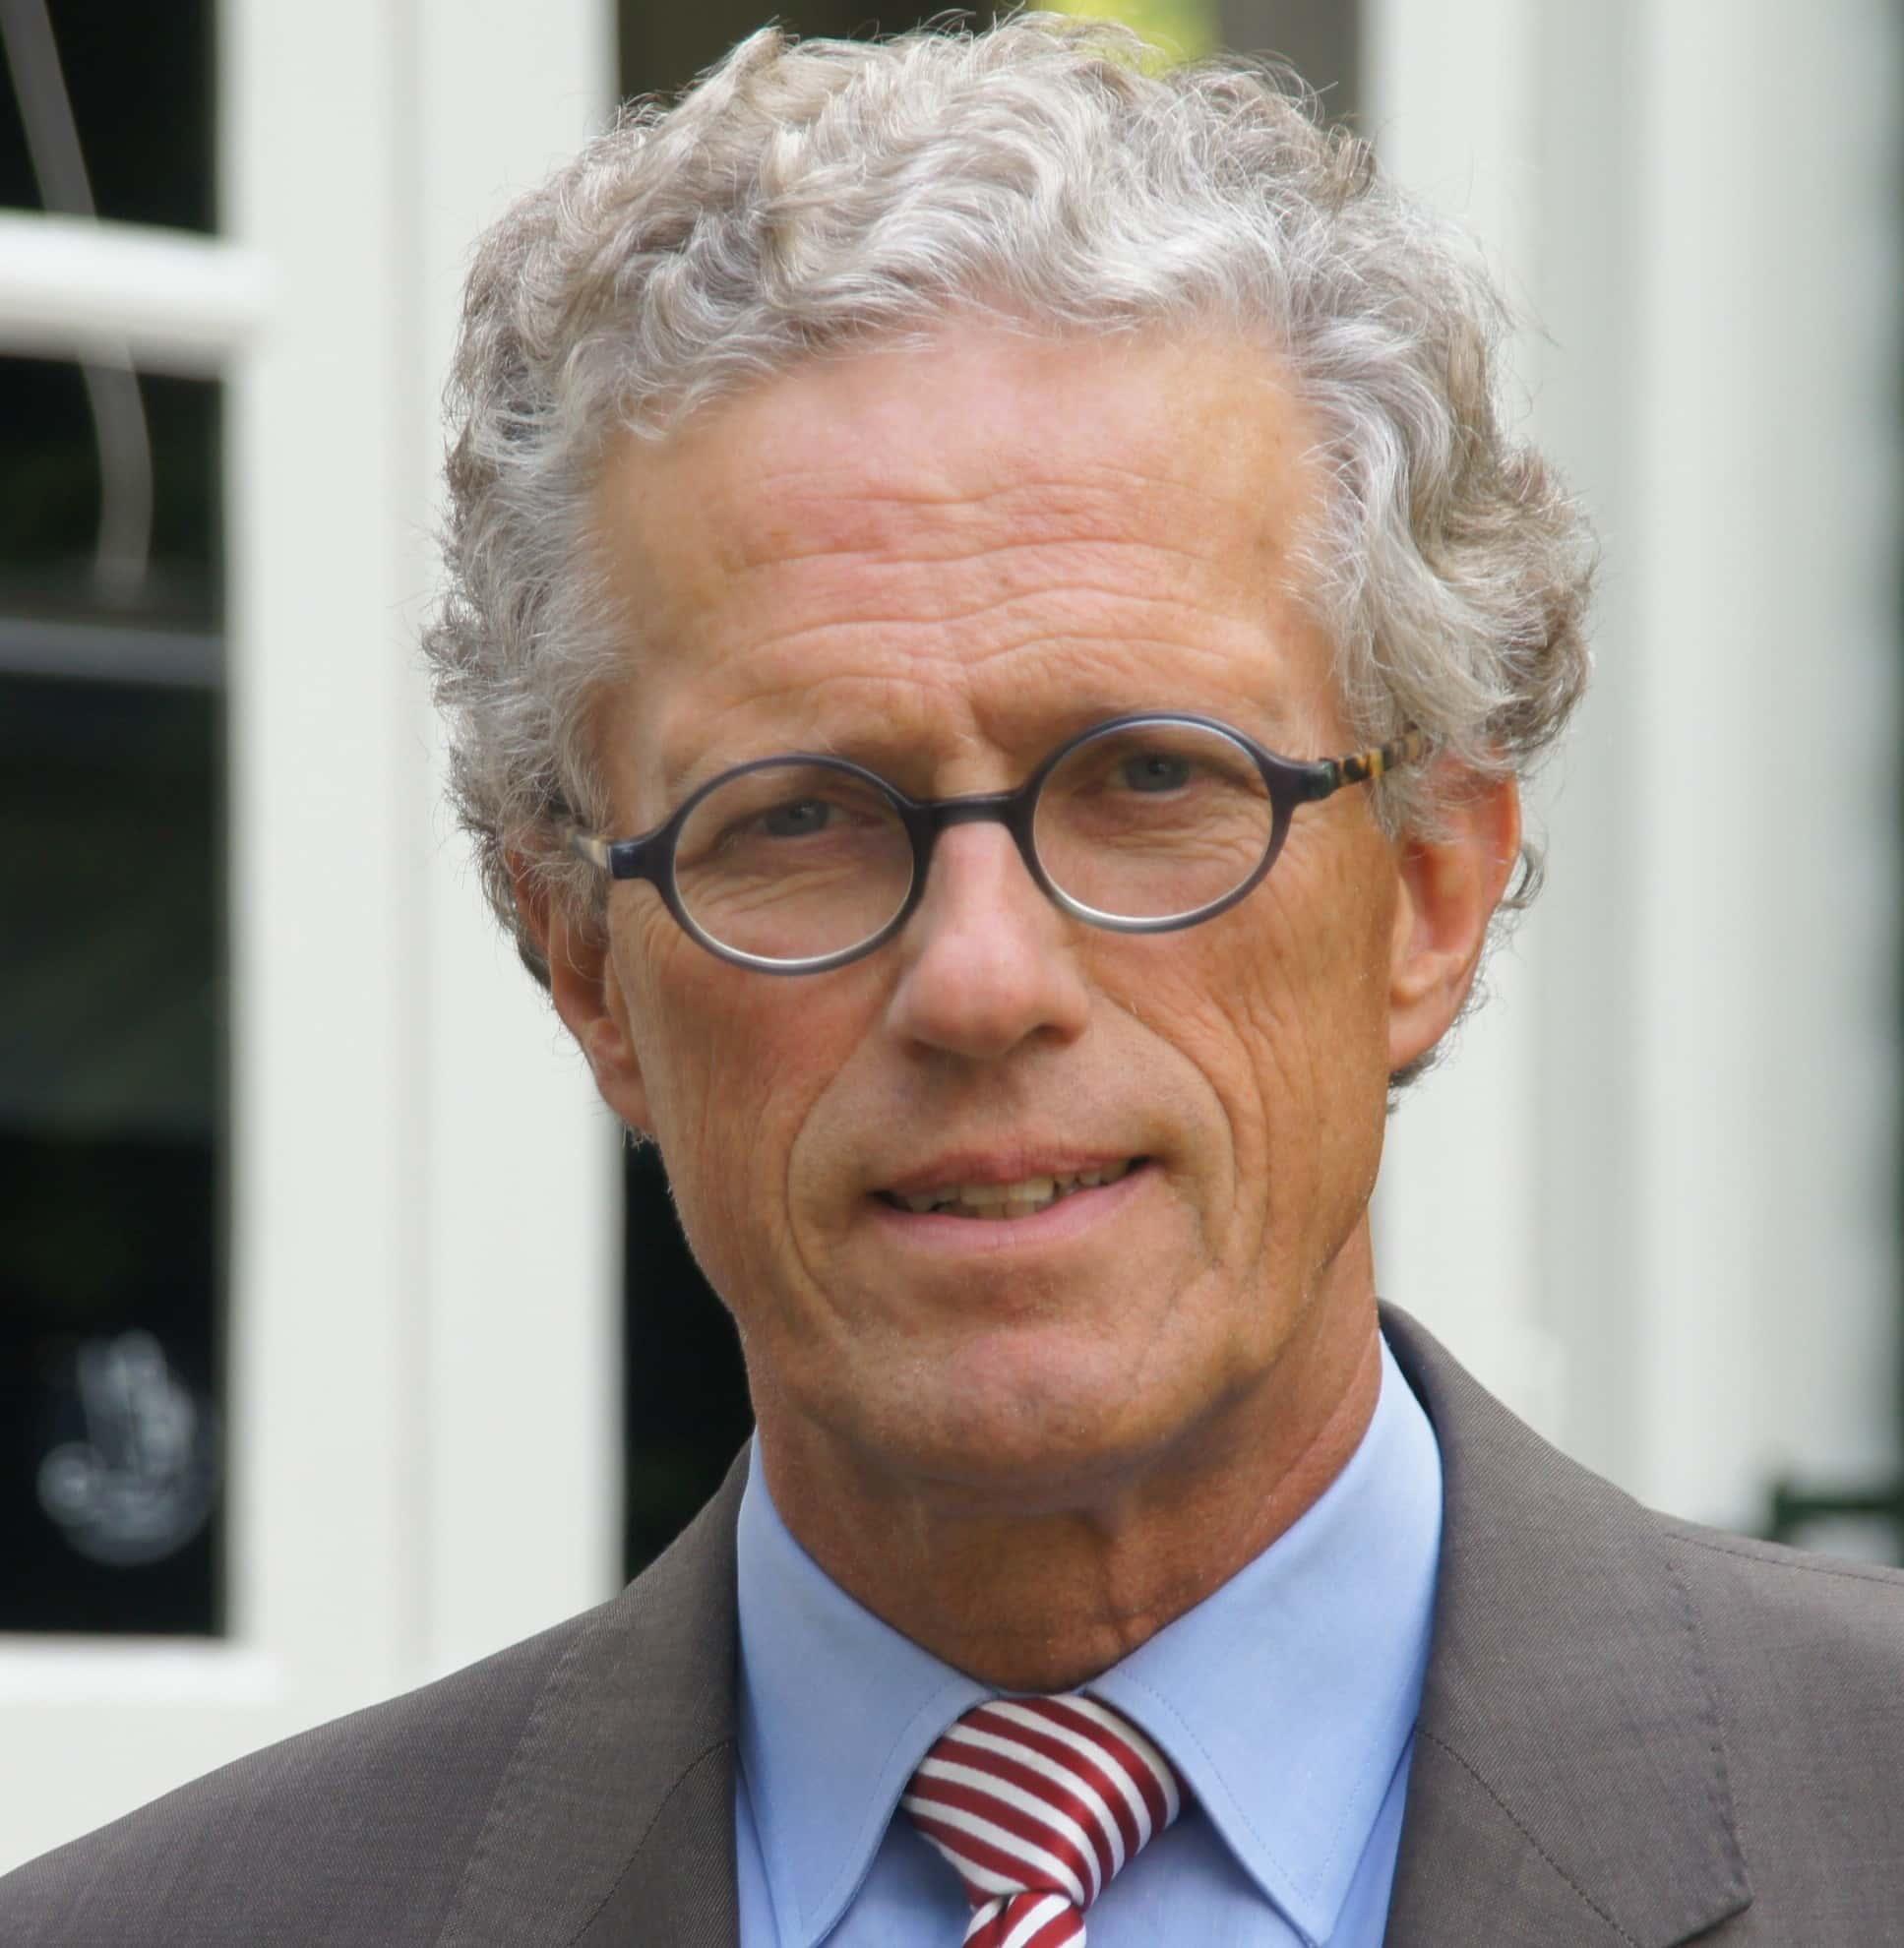 Frank Zuure